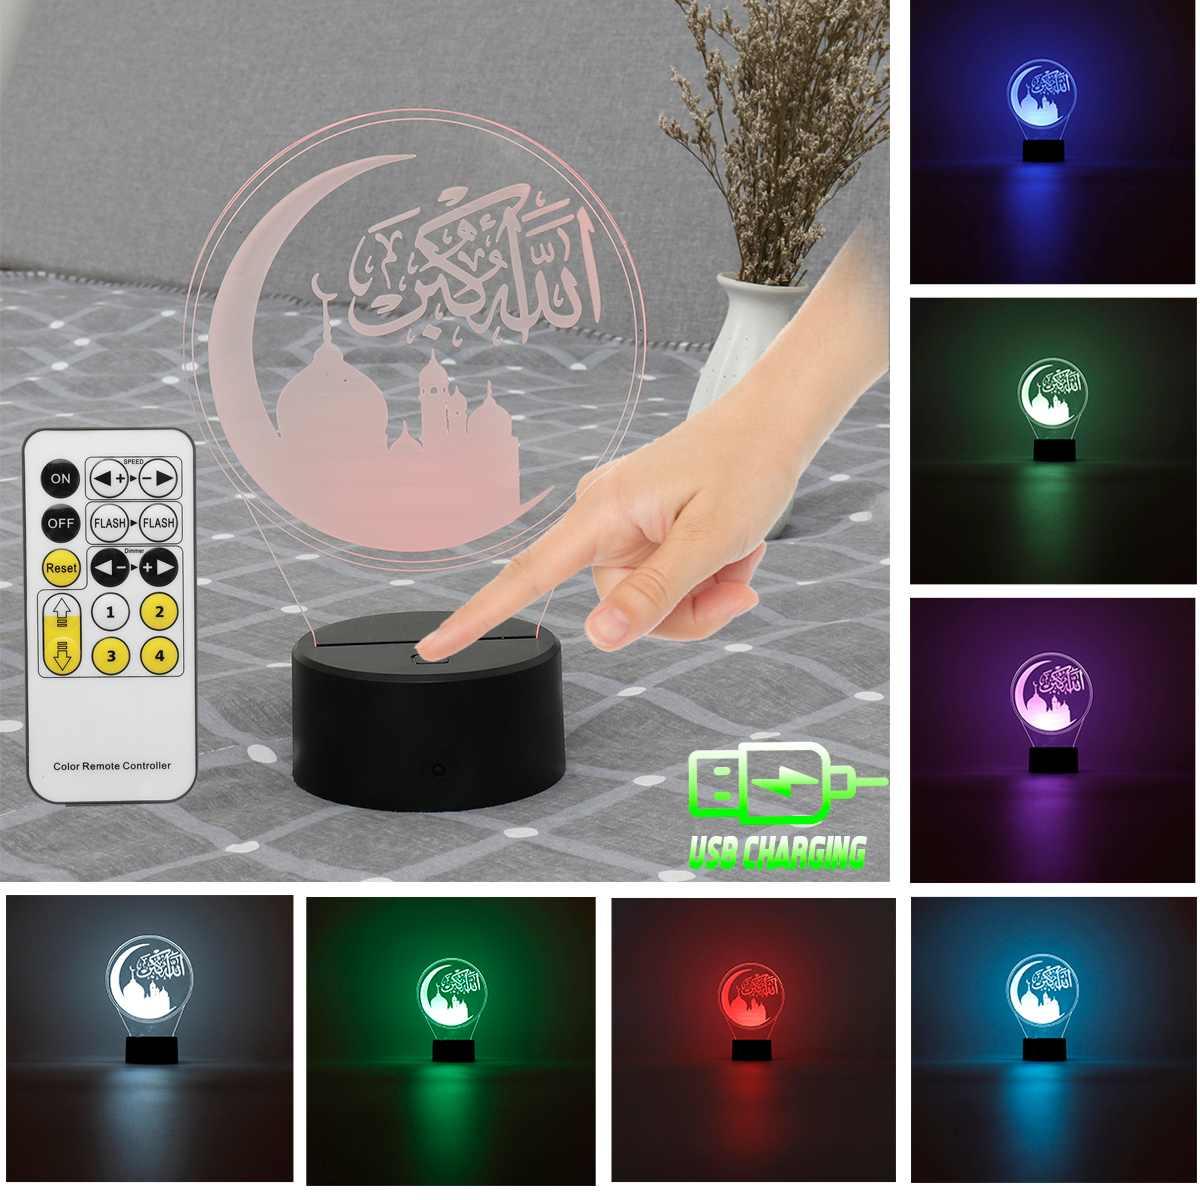 3D Night Light EID Mubarak Ramadan Islamic LED Color Desk Lamp Decor With Remote Control Flash/Brightness Adjustment Changing